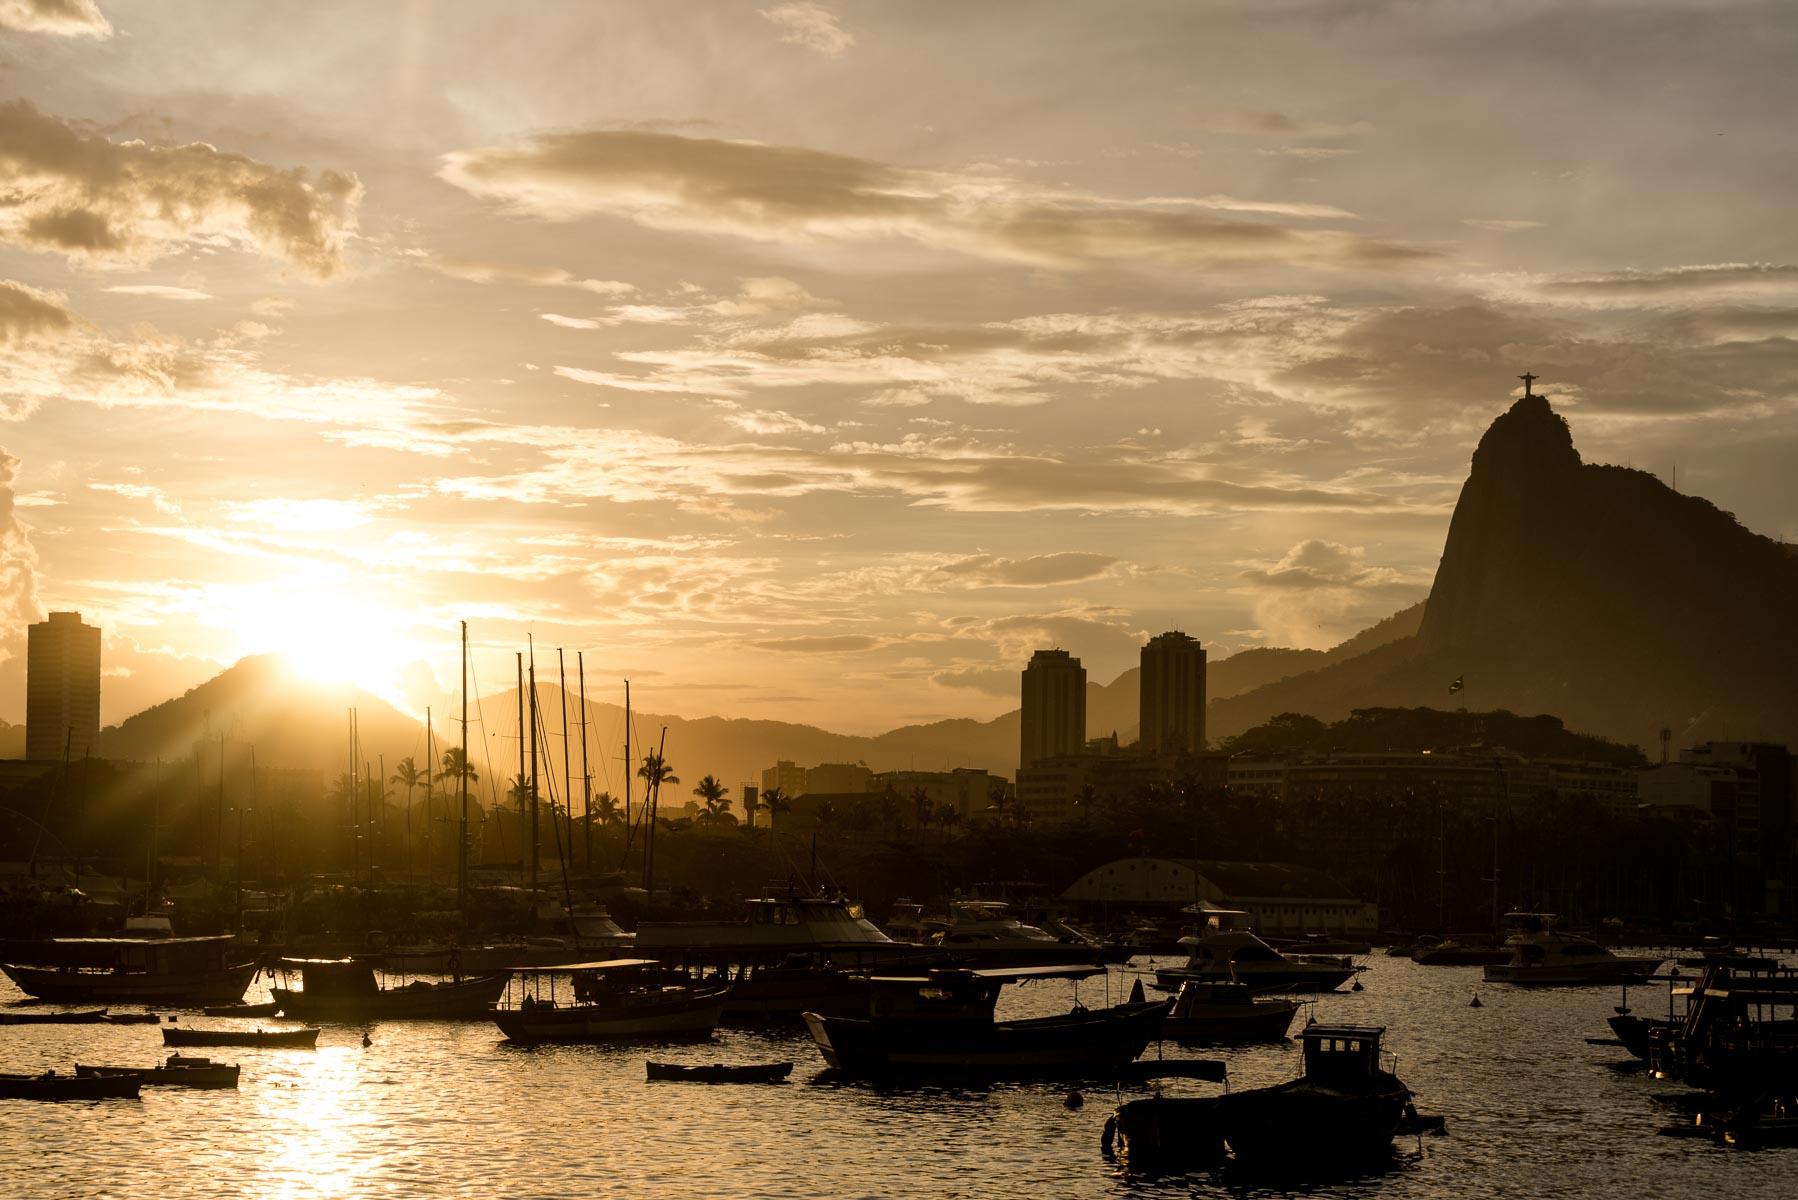 Christian Meixner Fotografie, Rio de Janeiro, Brasilien, Fotograf Zürich, Sonnenuntergang, Hafen, Christus, Reisen, Reisefotografie